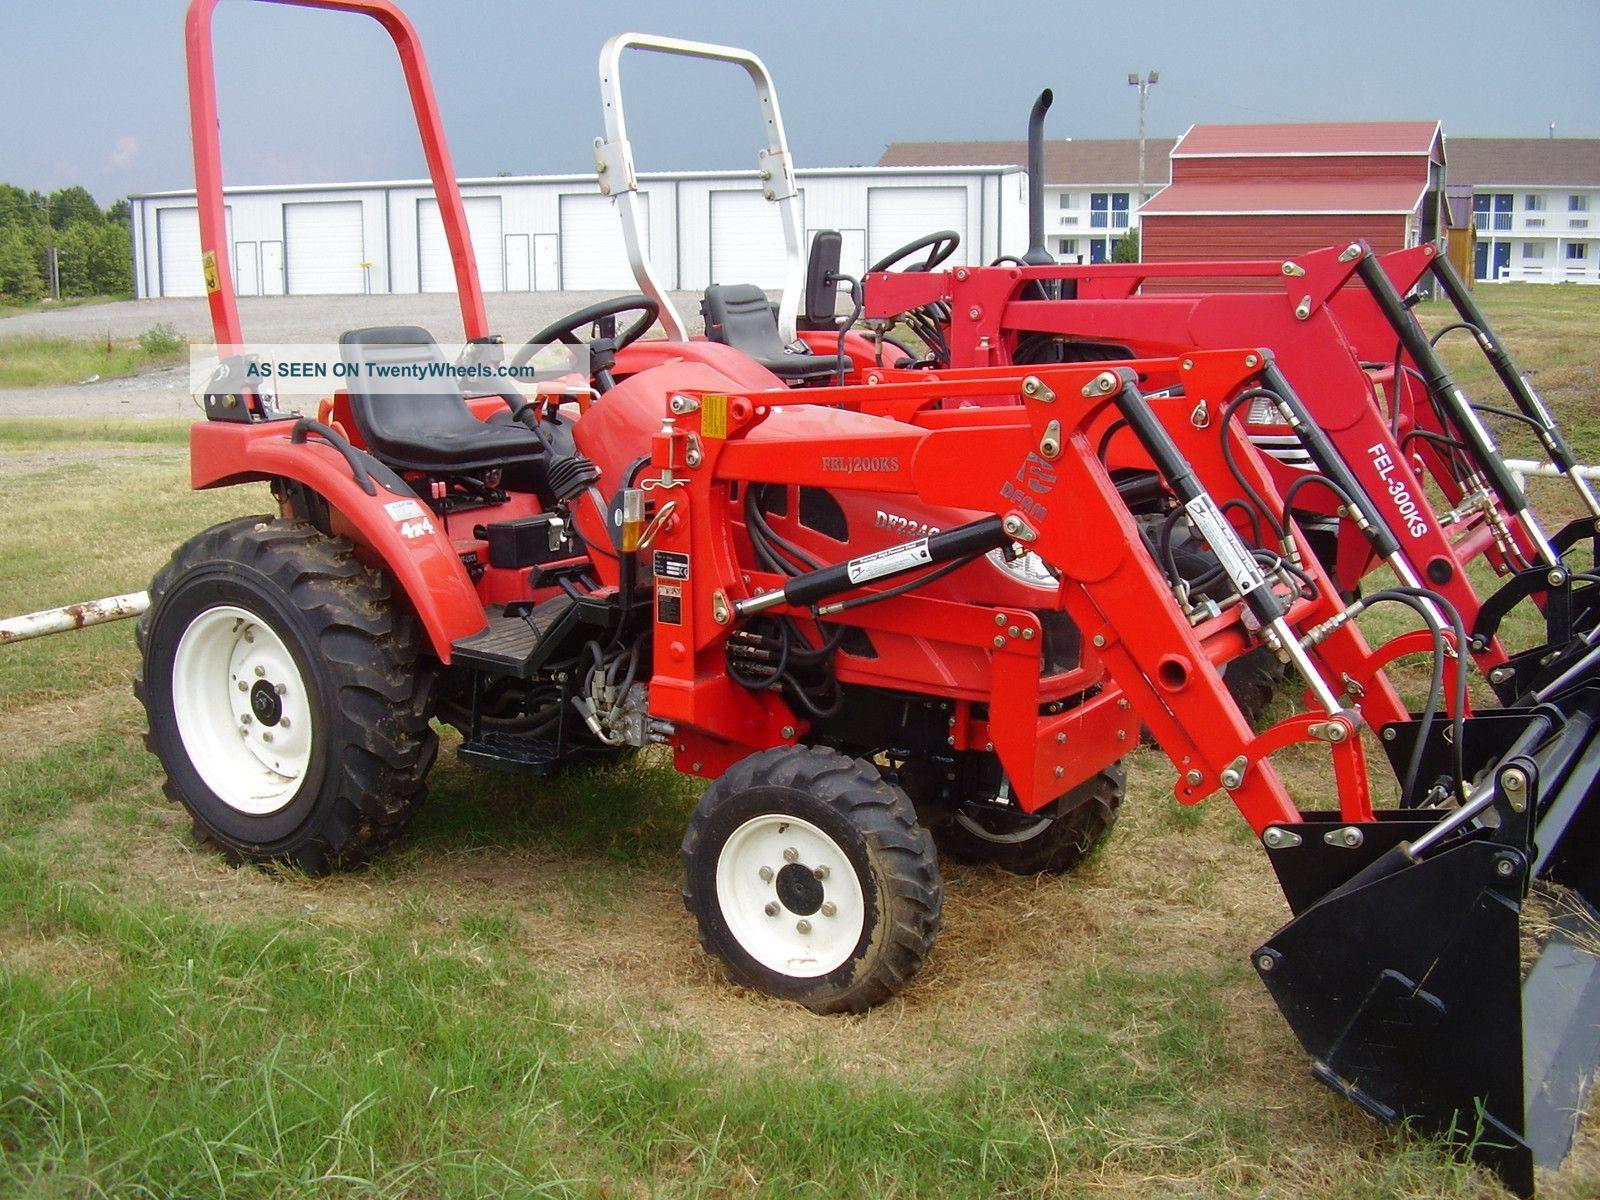 22hp 4wd Diesel Garden Tractor With Loader 4n1 Bucket